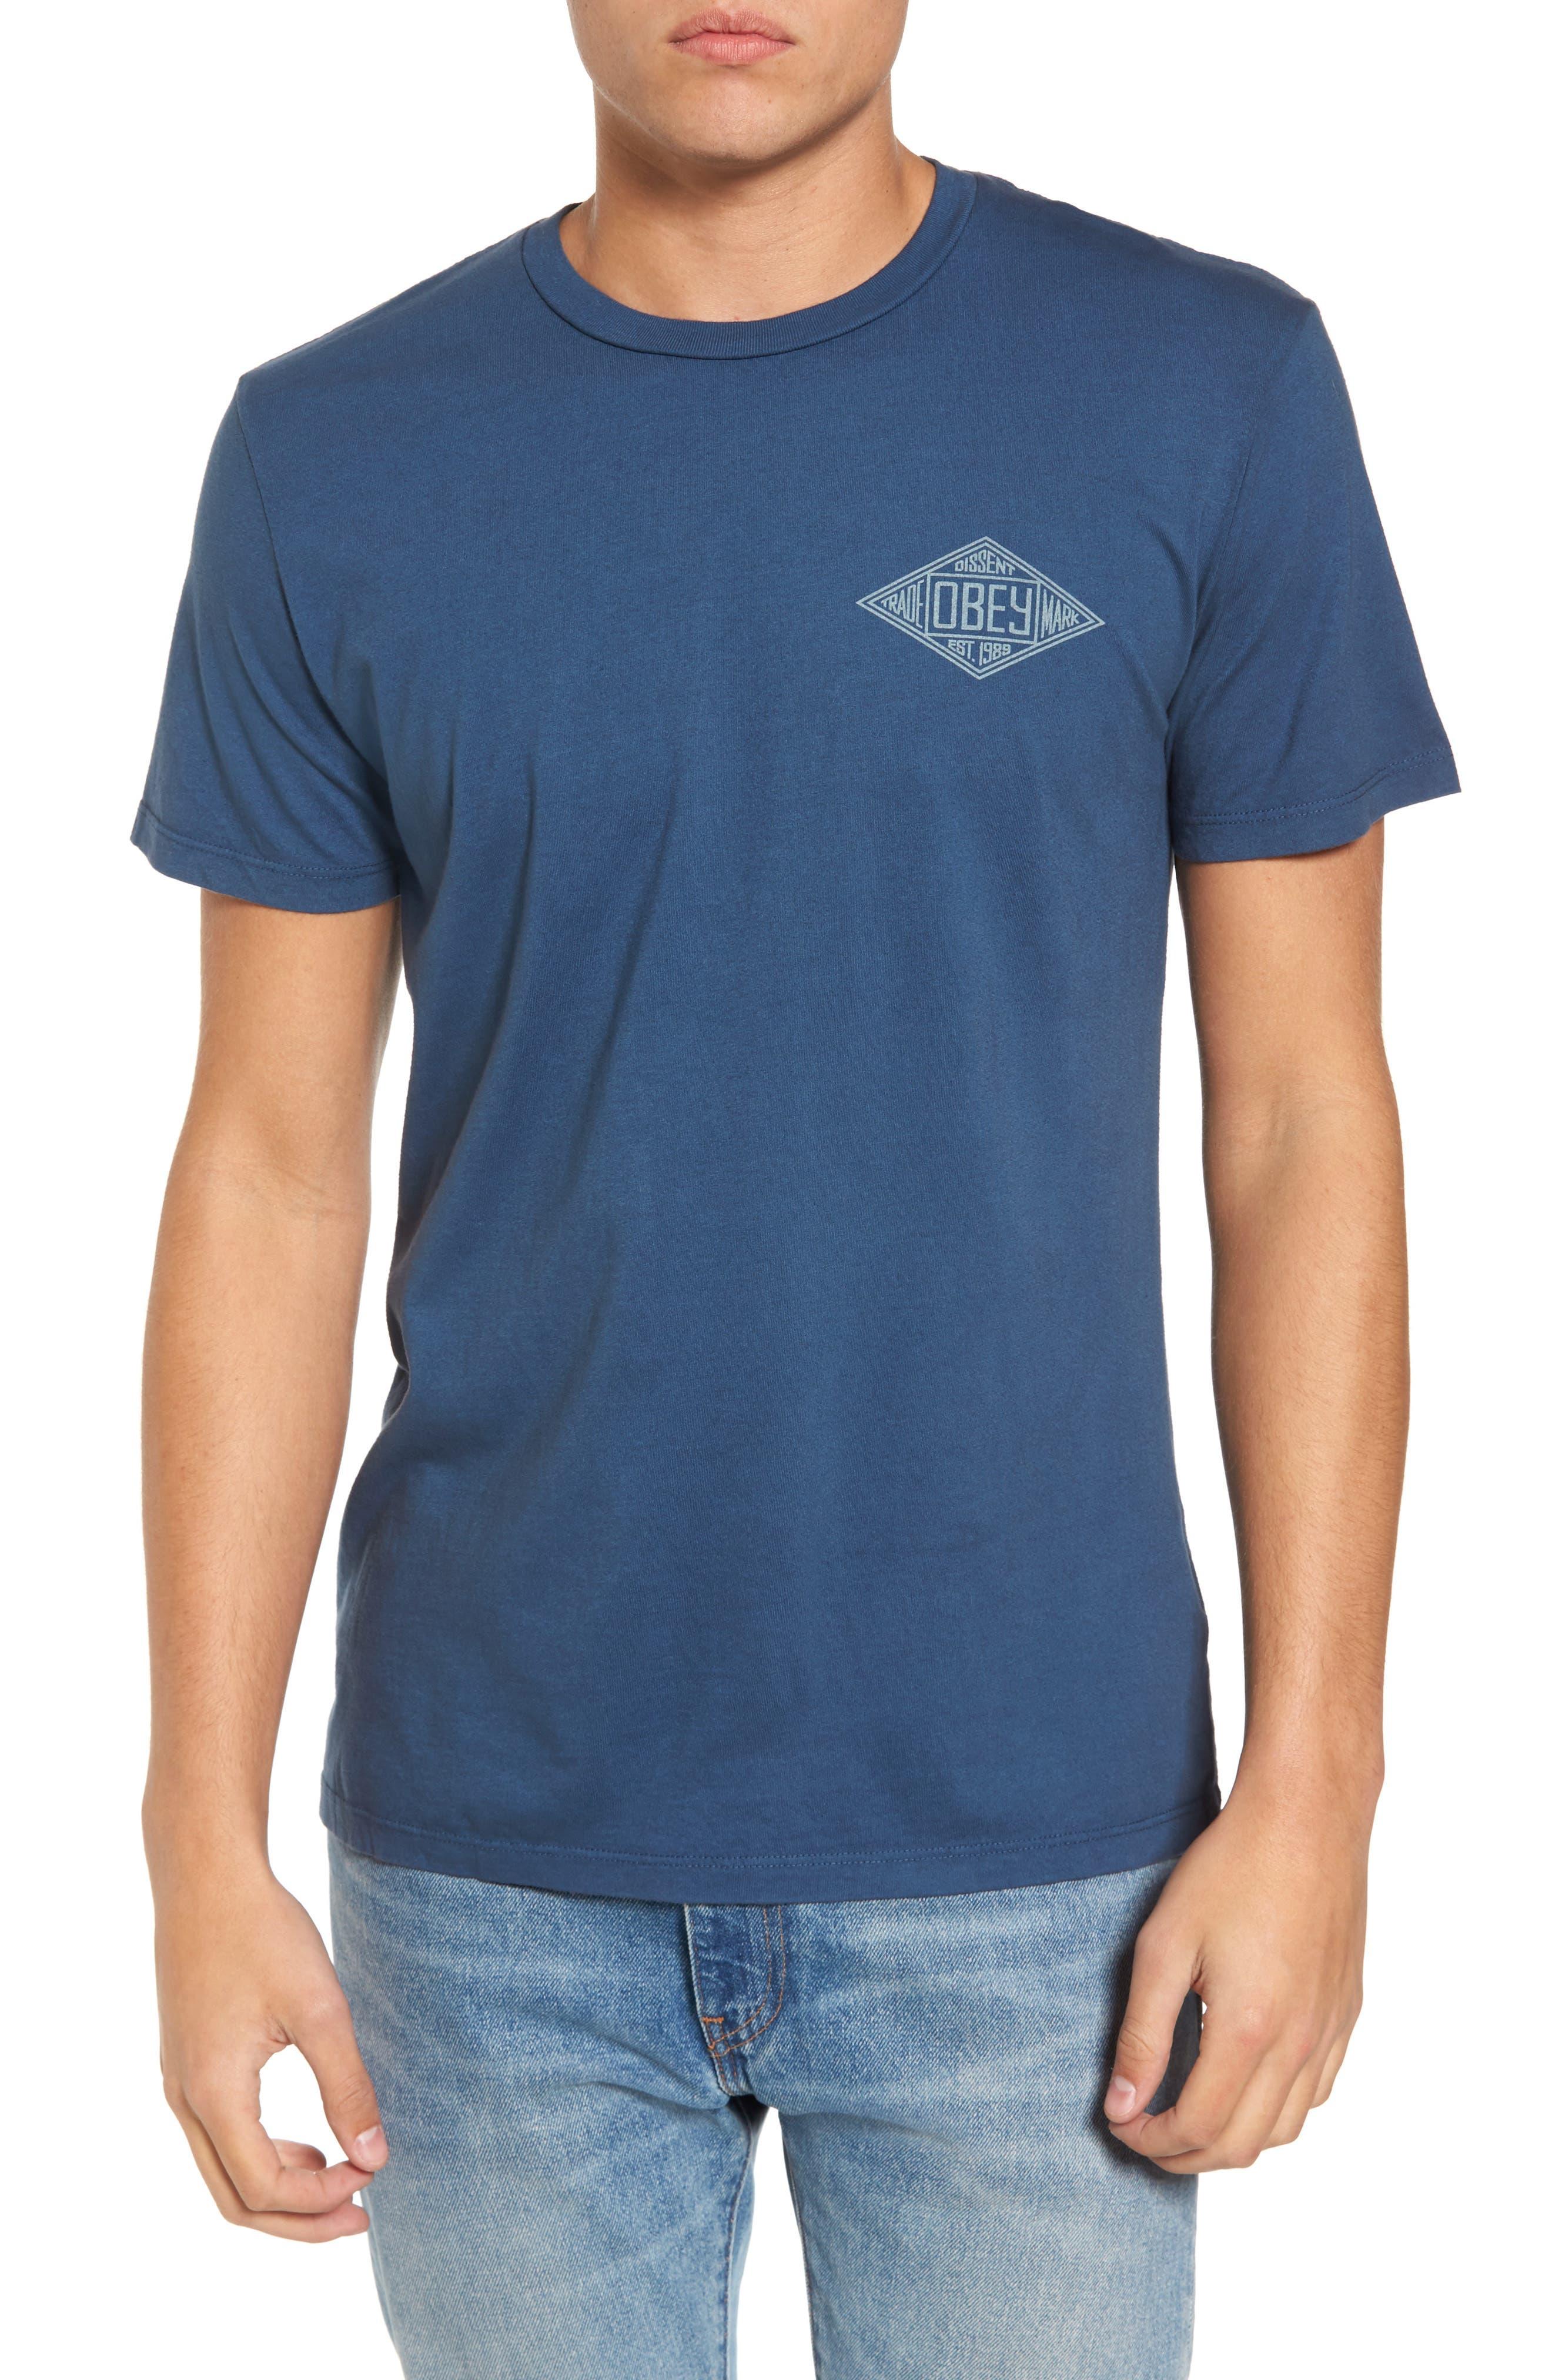 Trademark Diamond T-Shirt,                             Main thumbnail 1, color,                             424